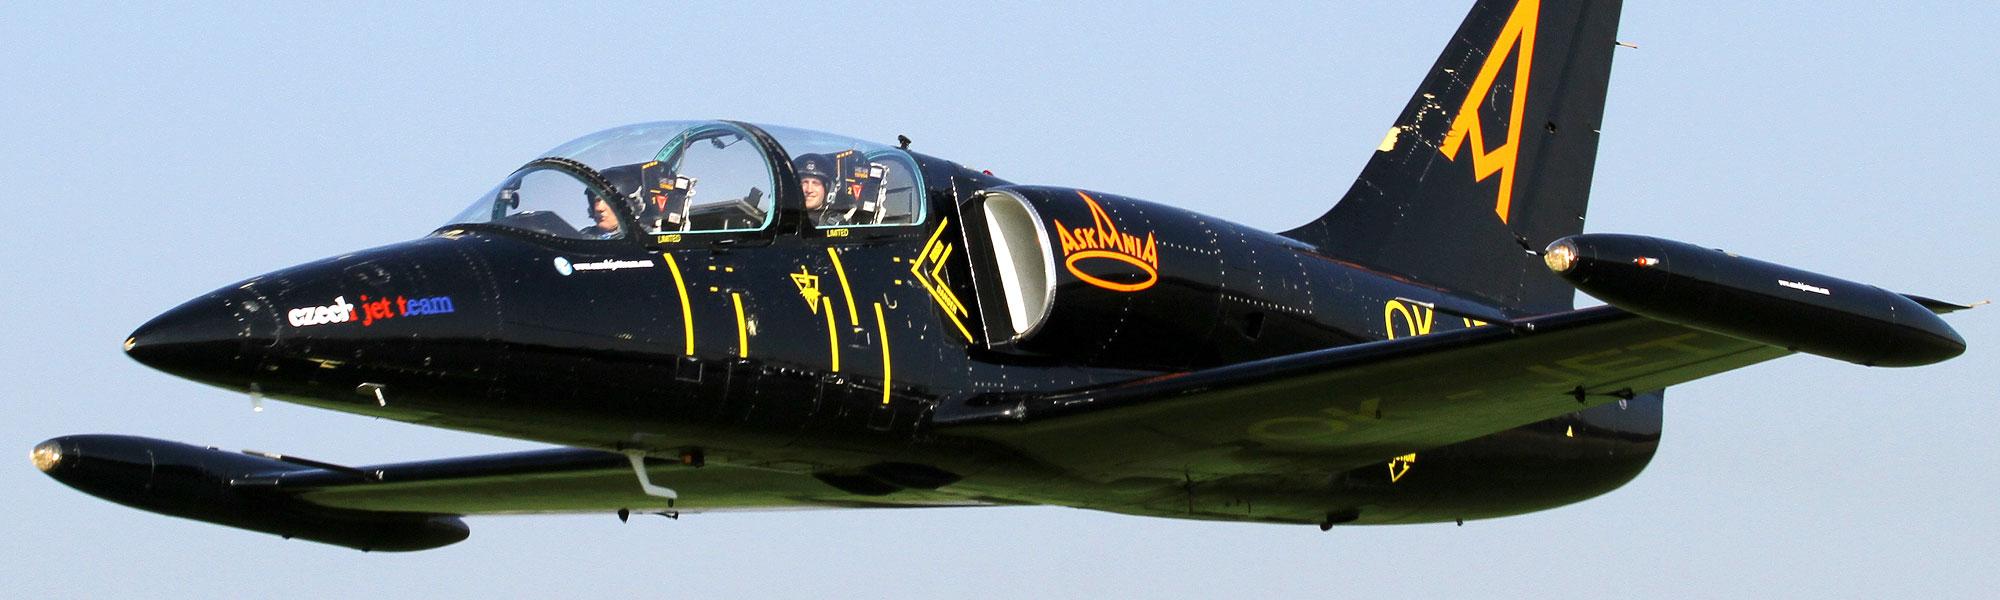 L-39 Kampfjet in Tschechien